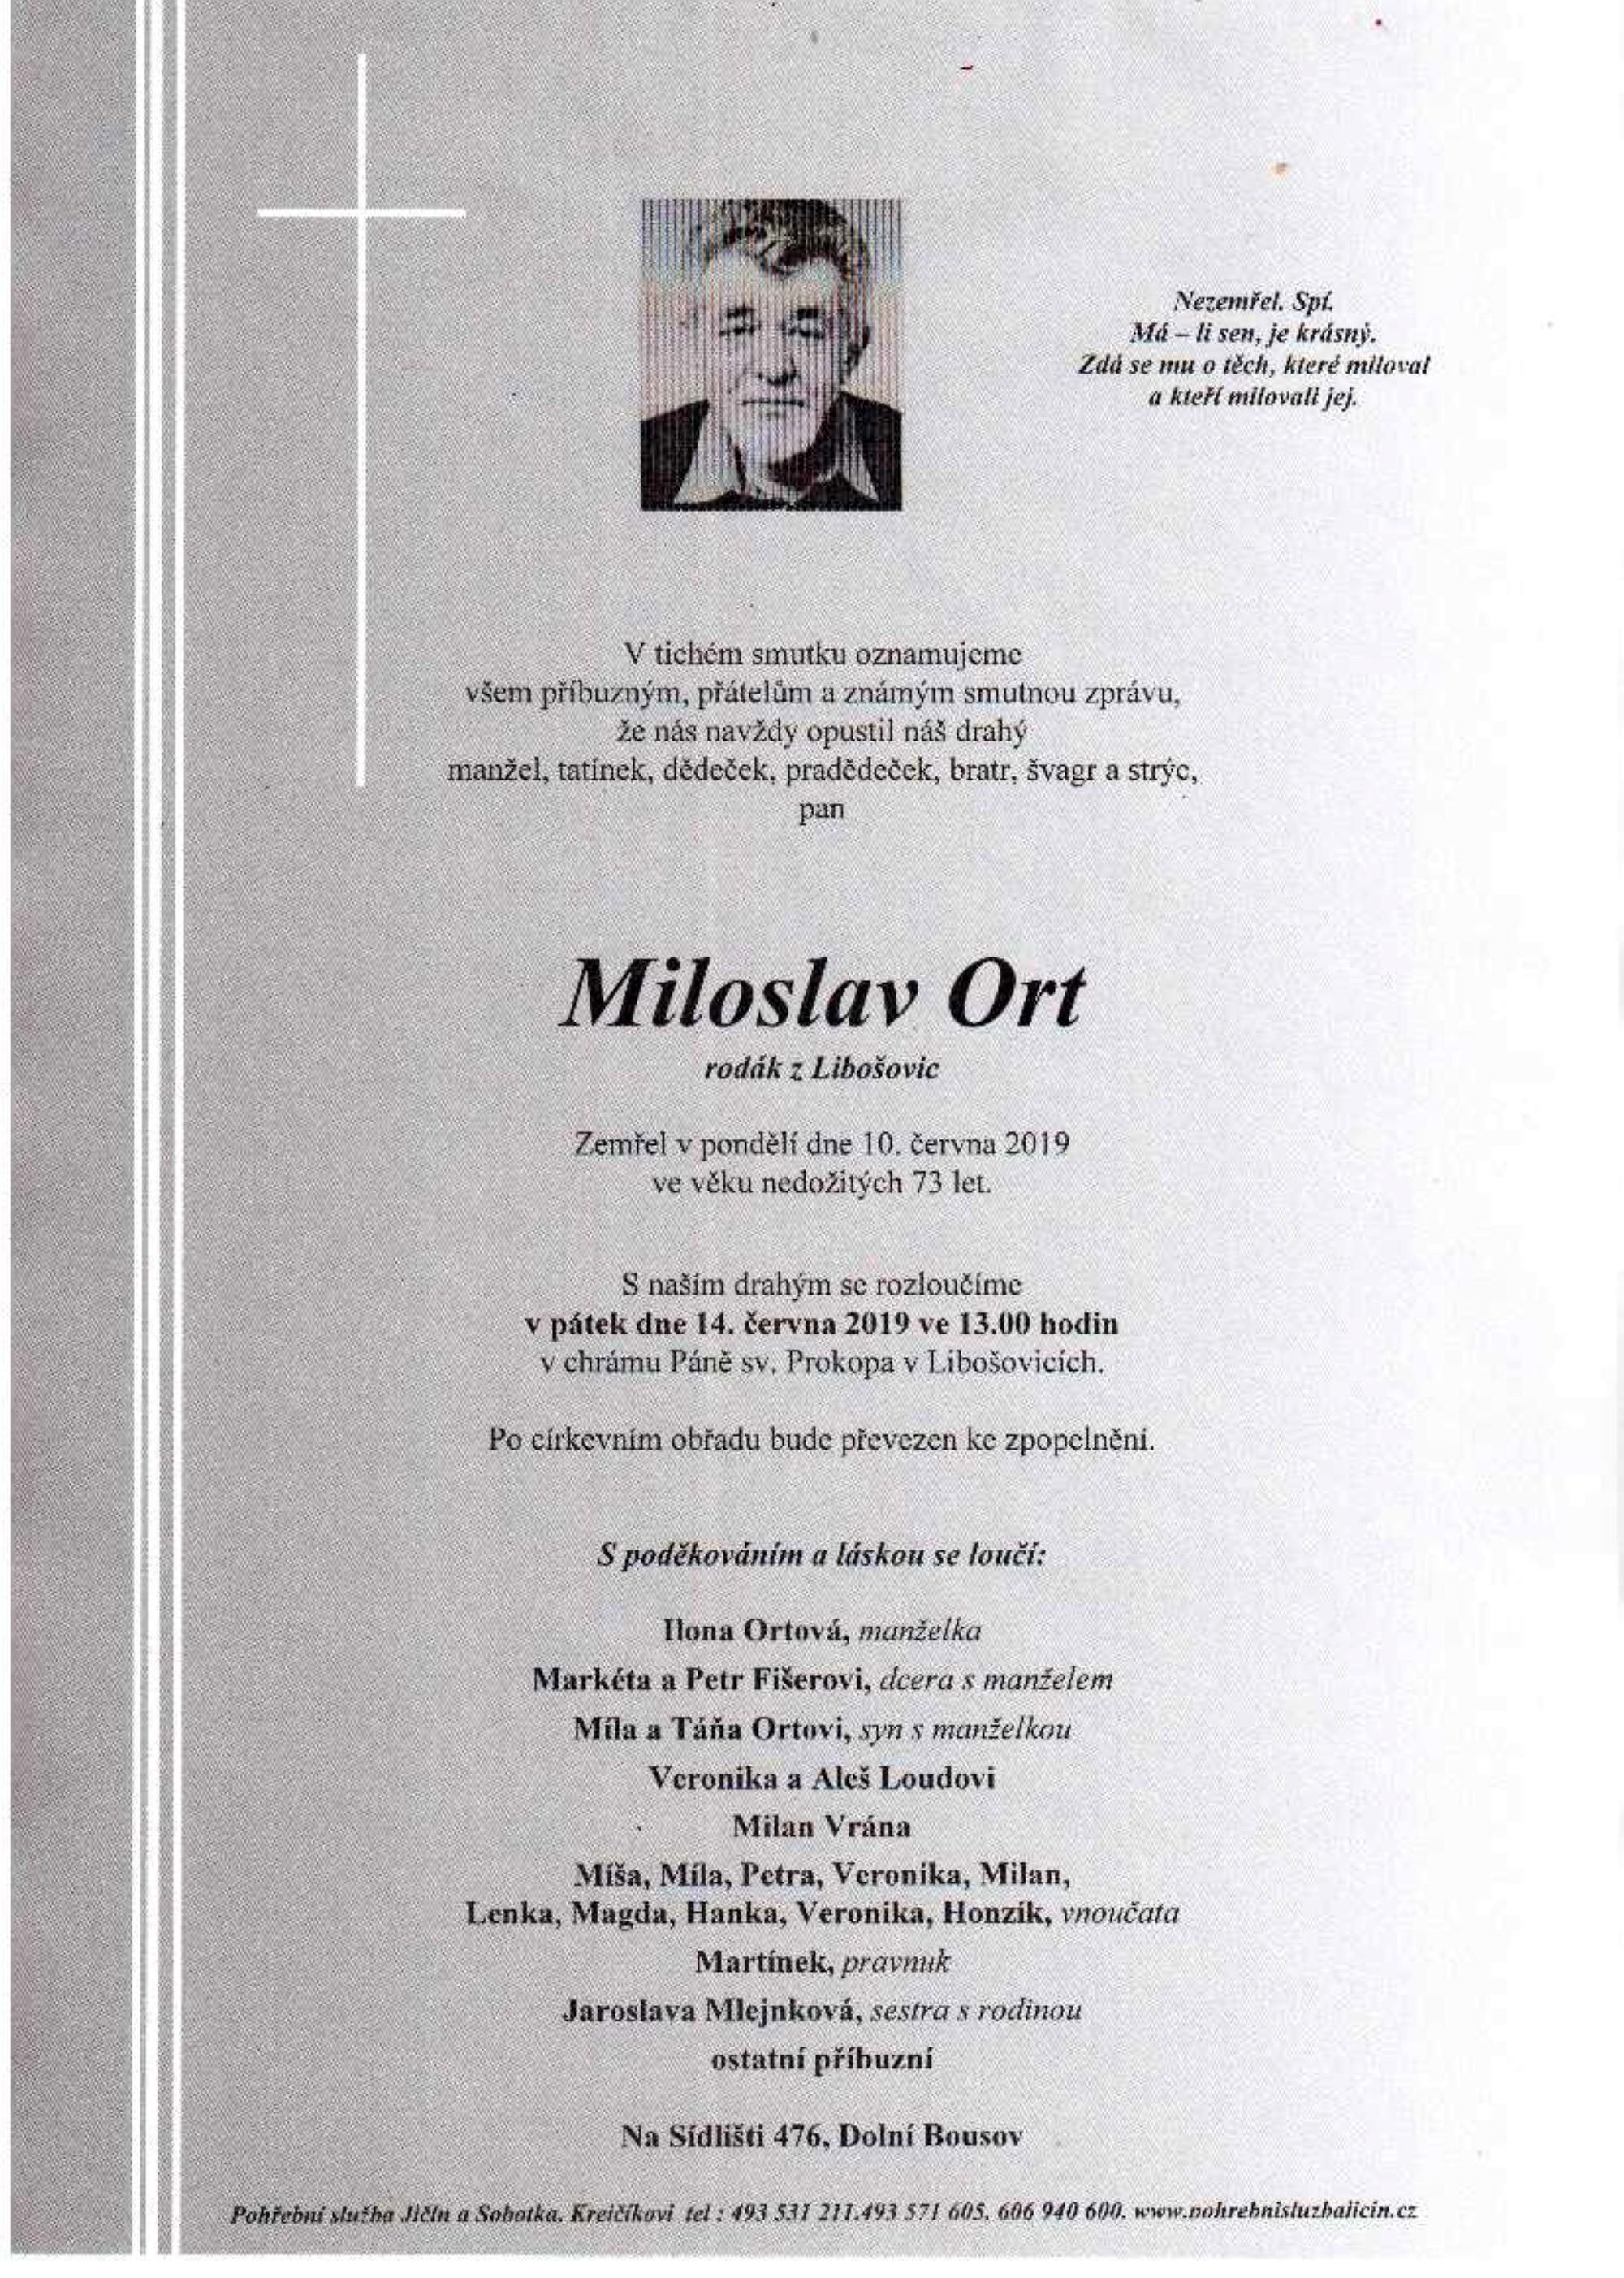 Miloslav Ort